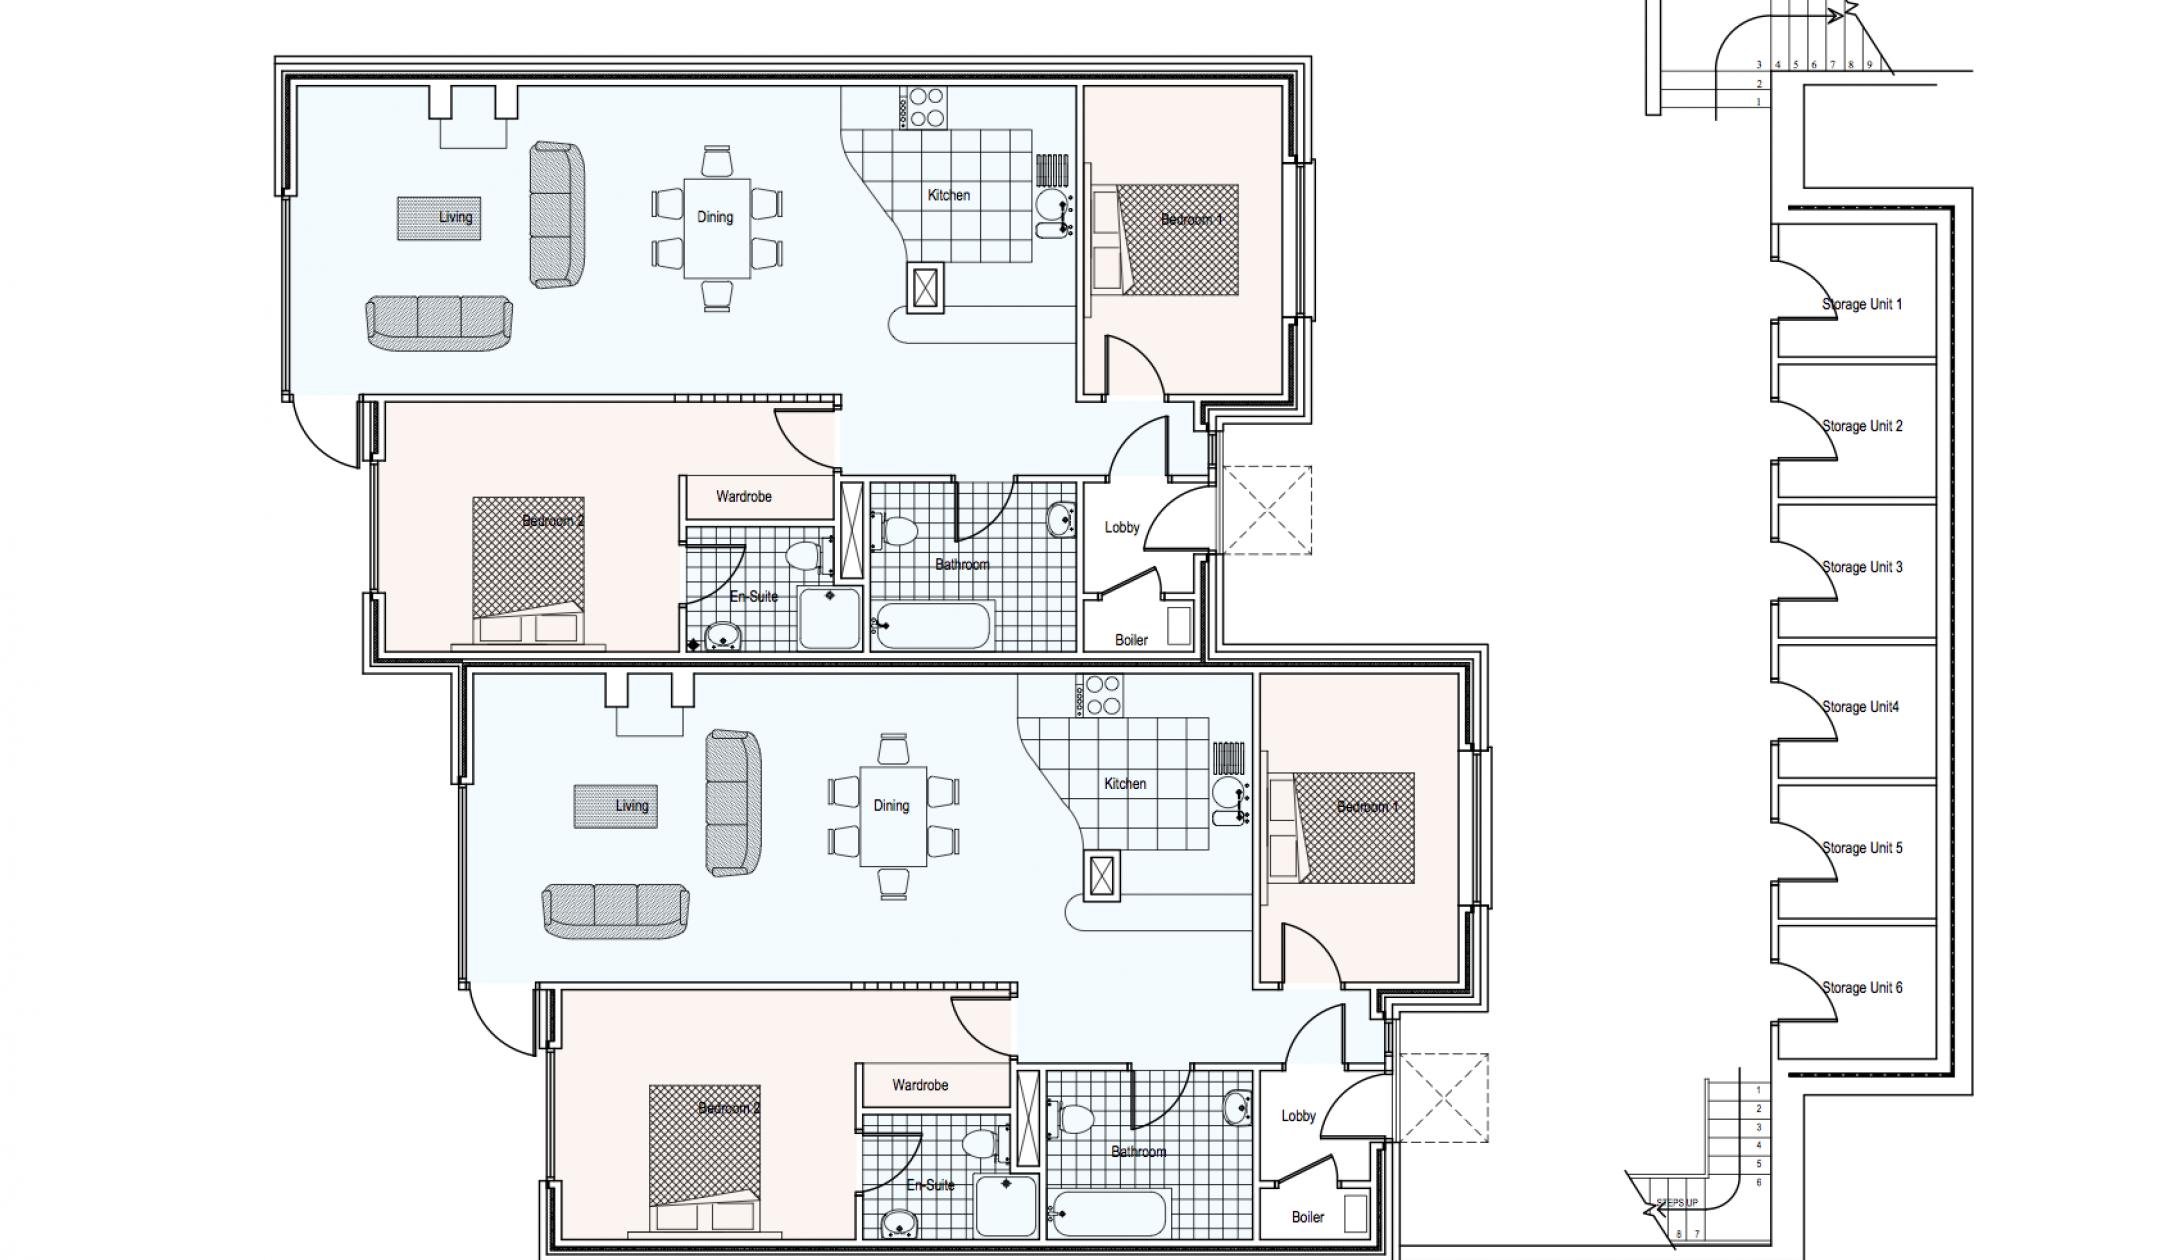 Ard Na Gceapairi Apartments Lower Ground Floor Plan